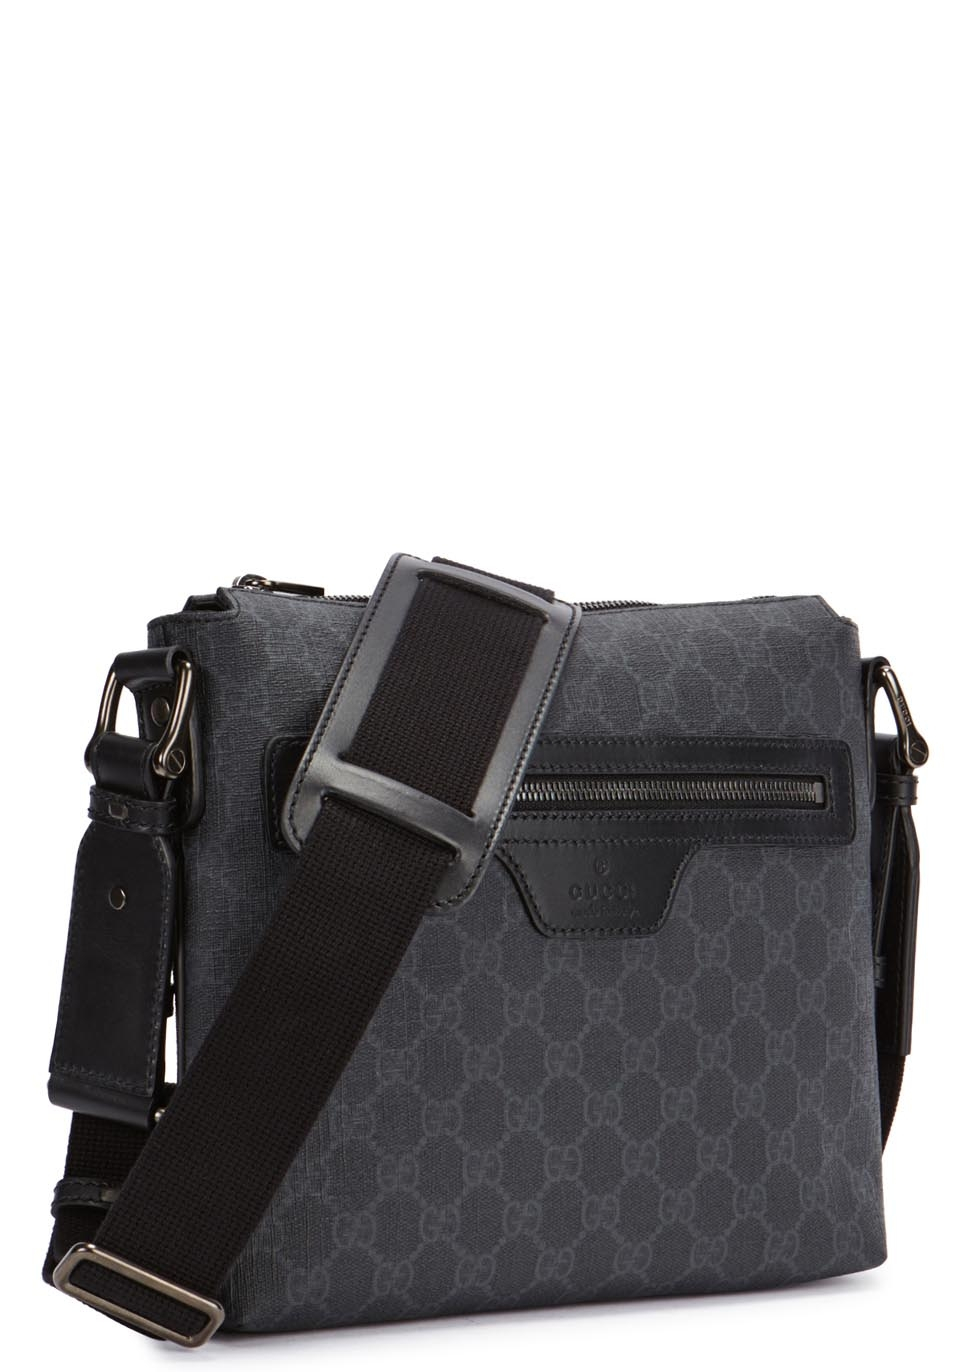 96b0df62bdf8 Gucci Gg Supreme Monogrammed Cross-Body Bag in Black for Men - Lyst